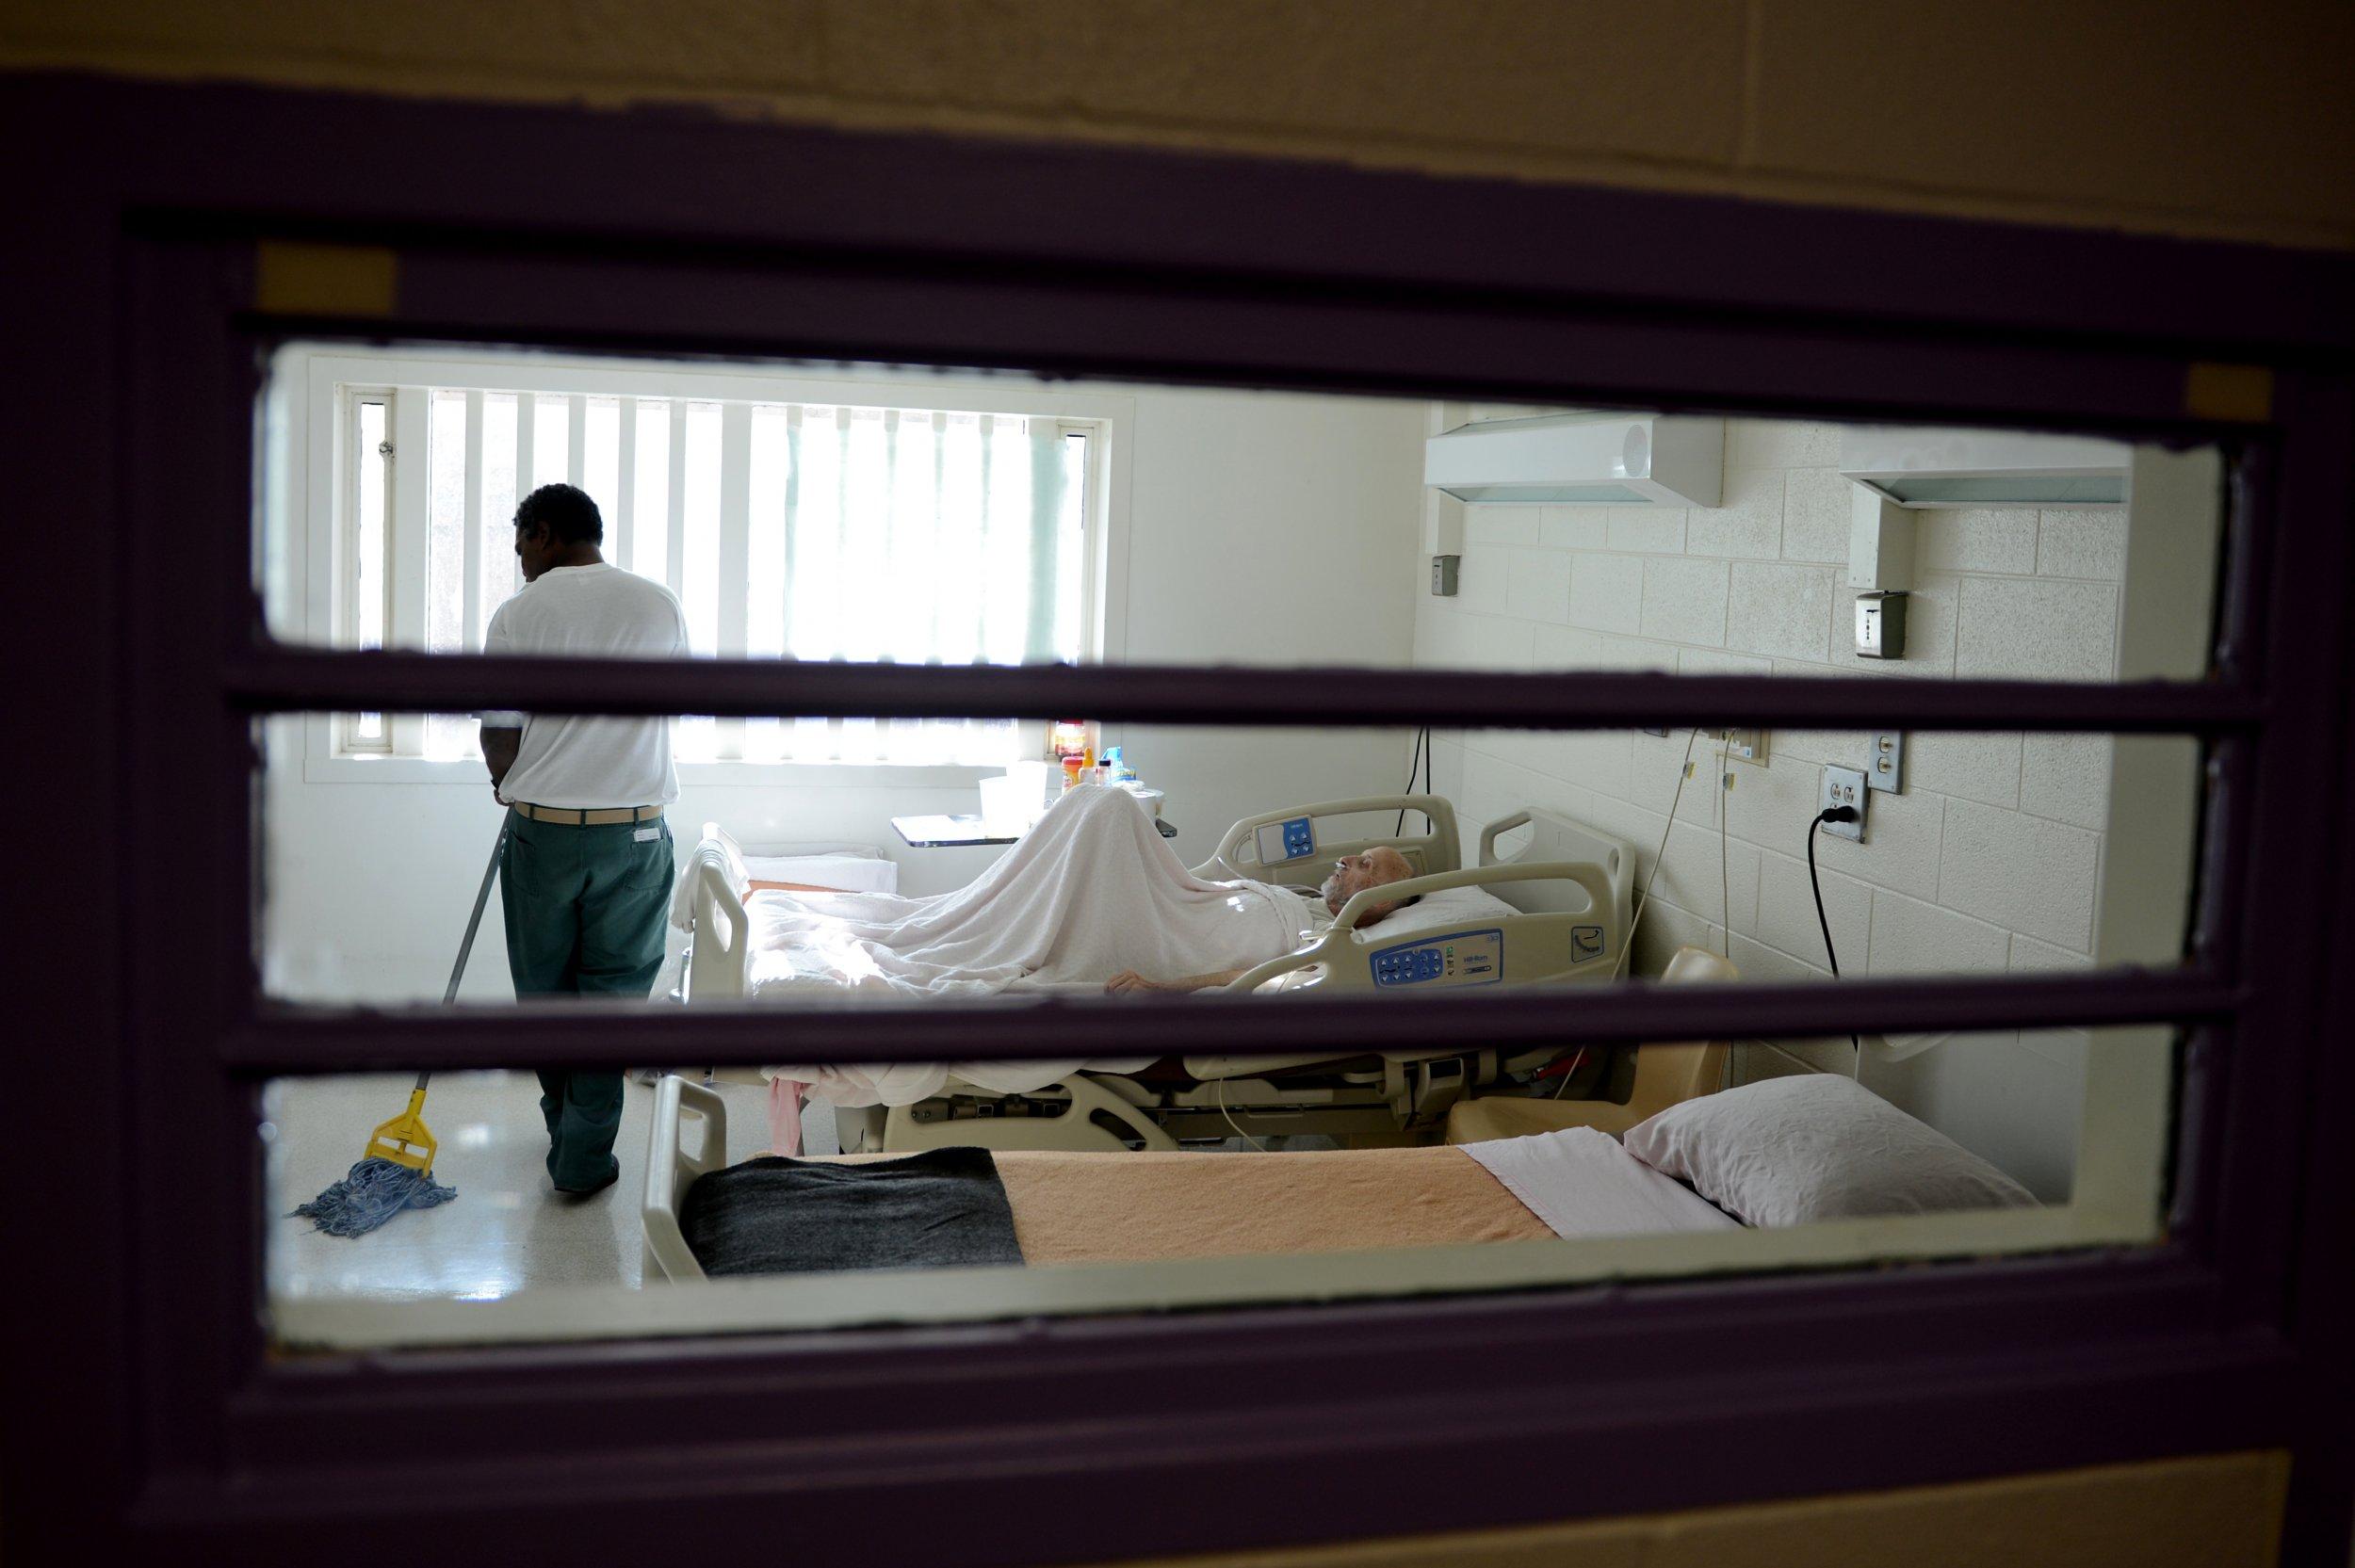 07_31_Prisons_01